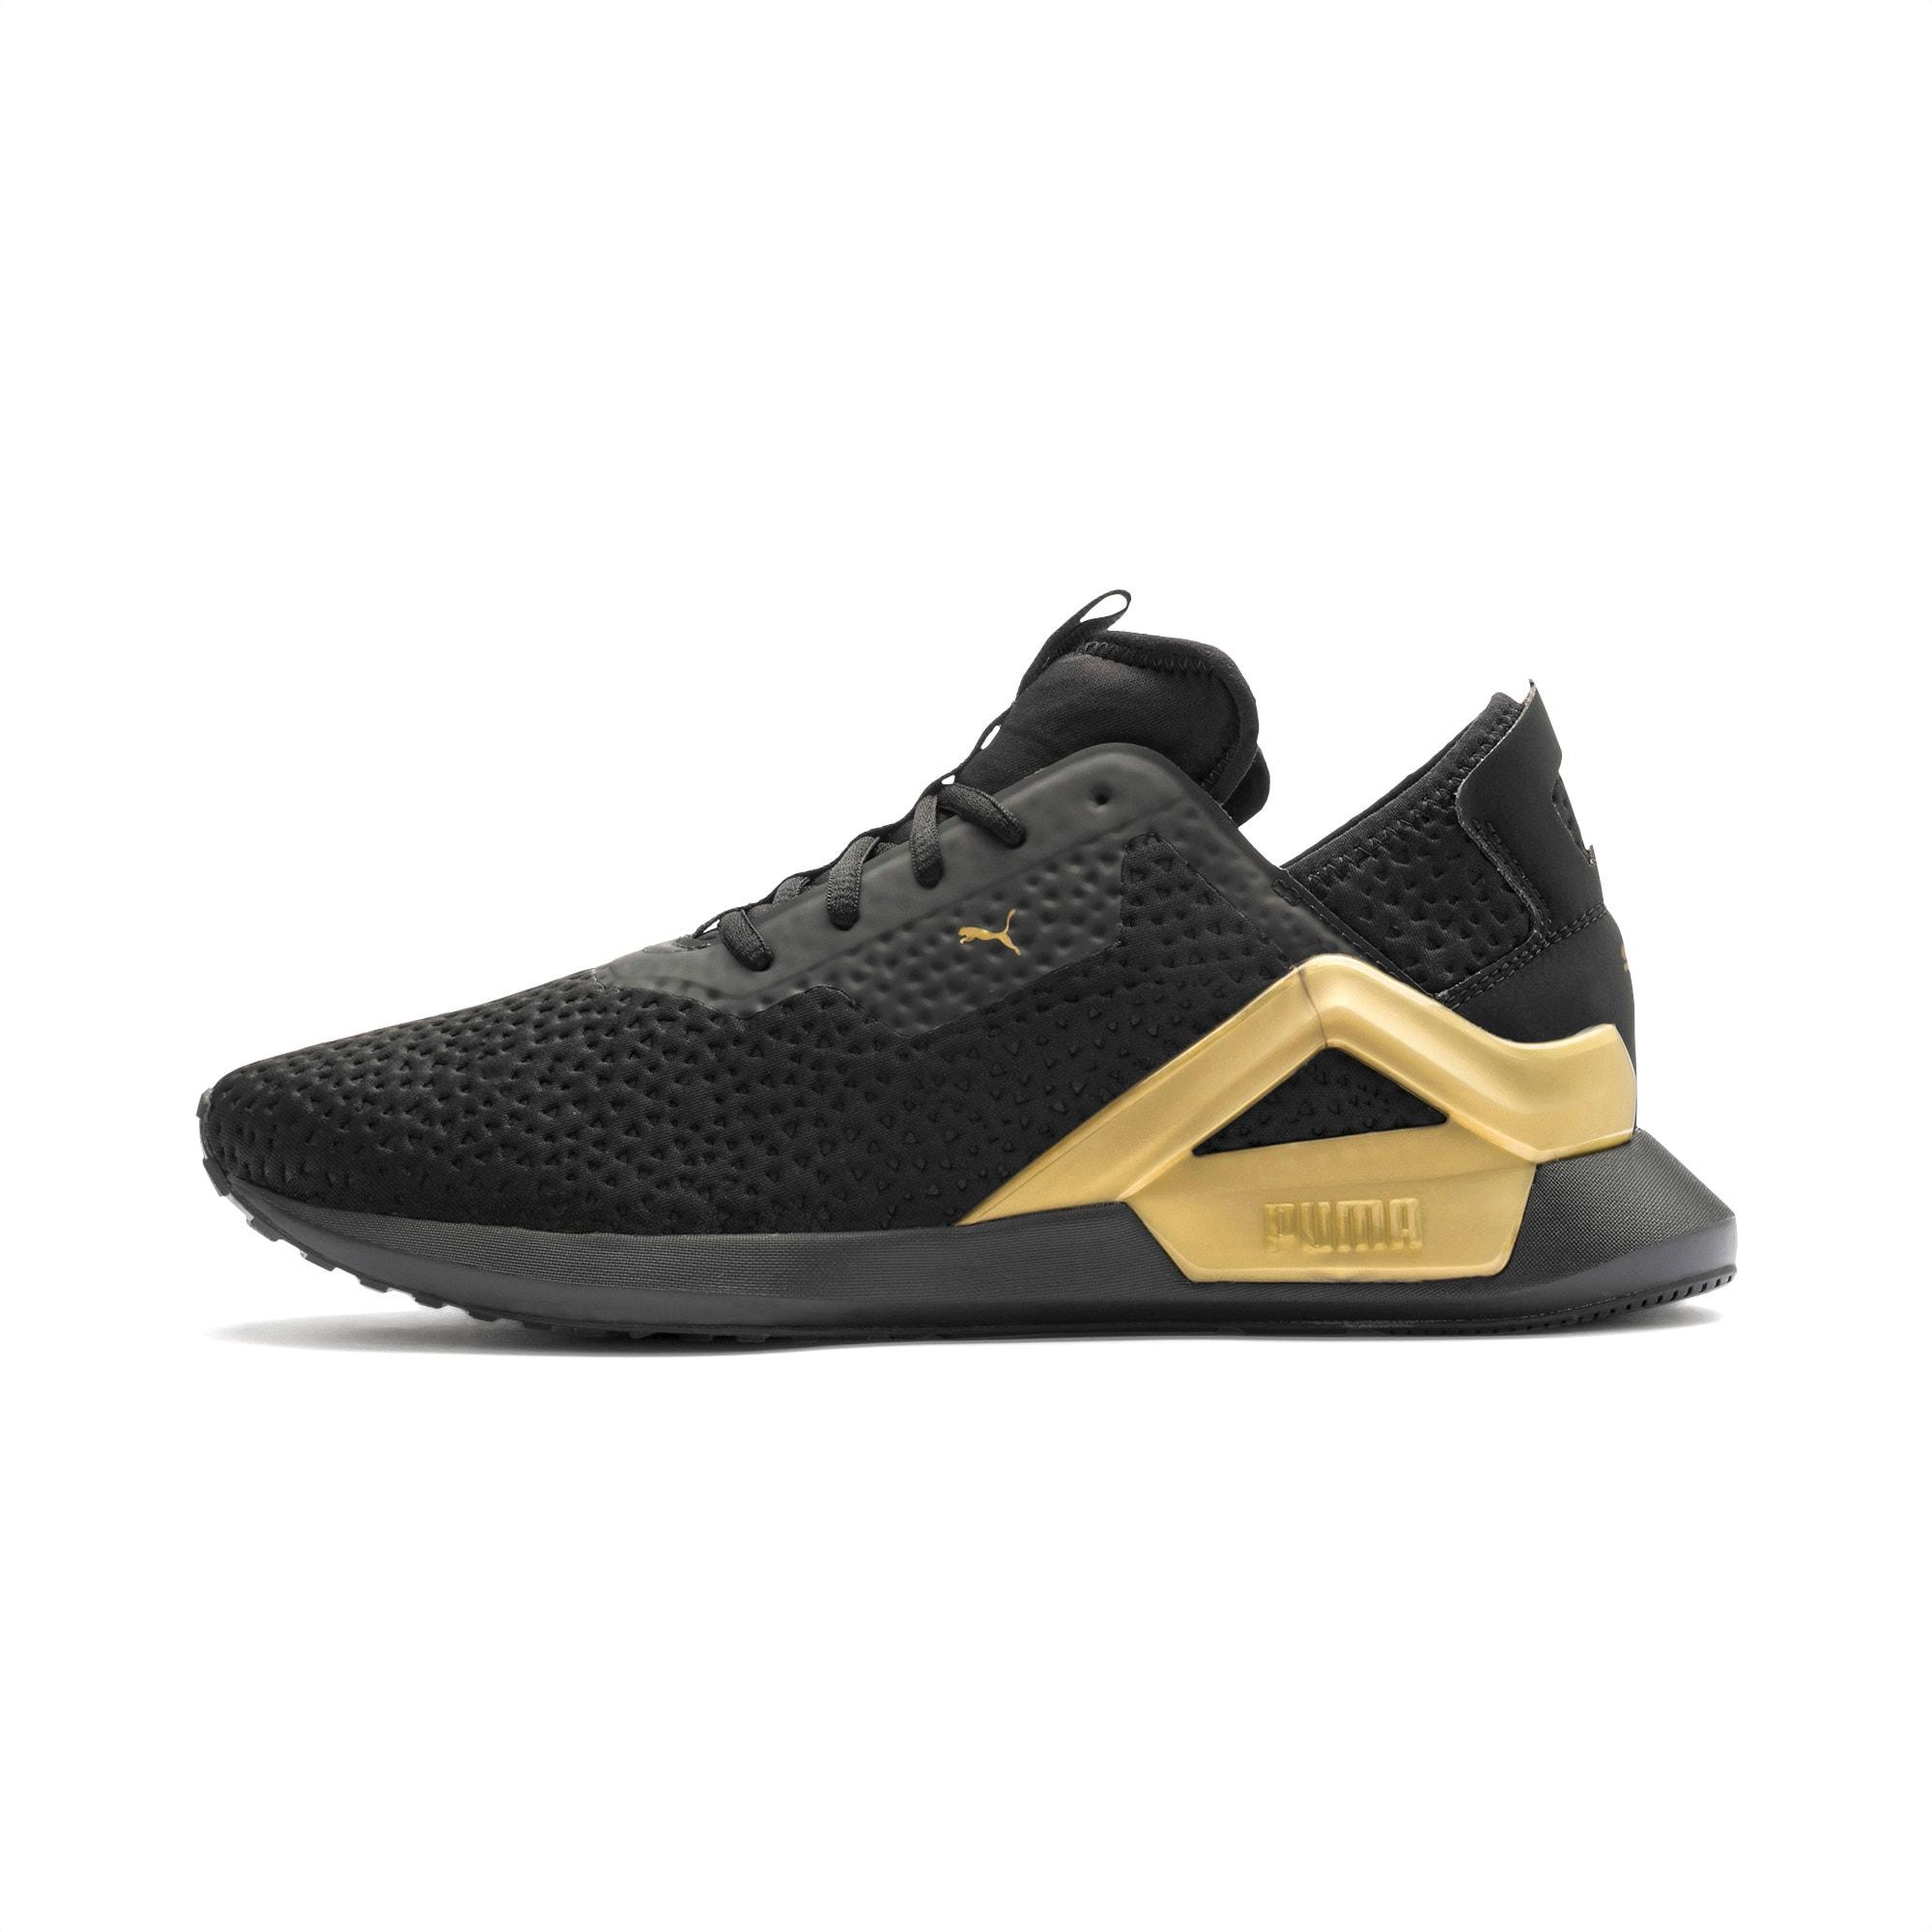 Rogue X Metallic Puma Black-Gold